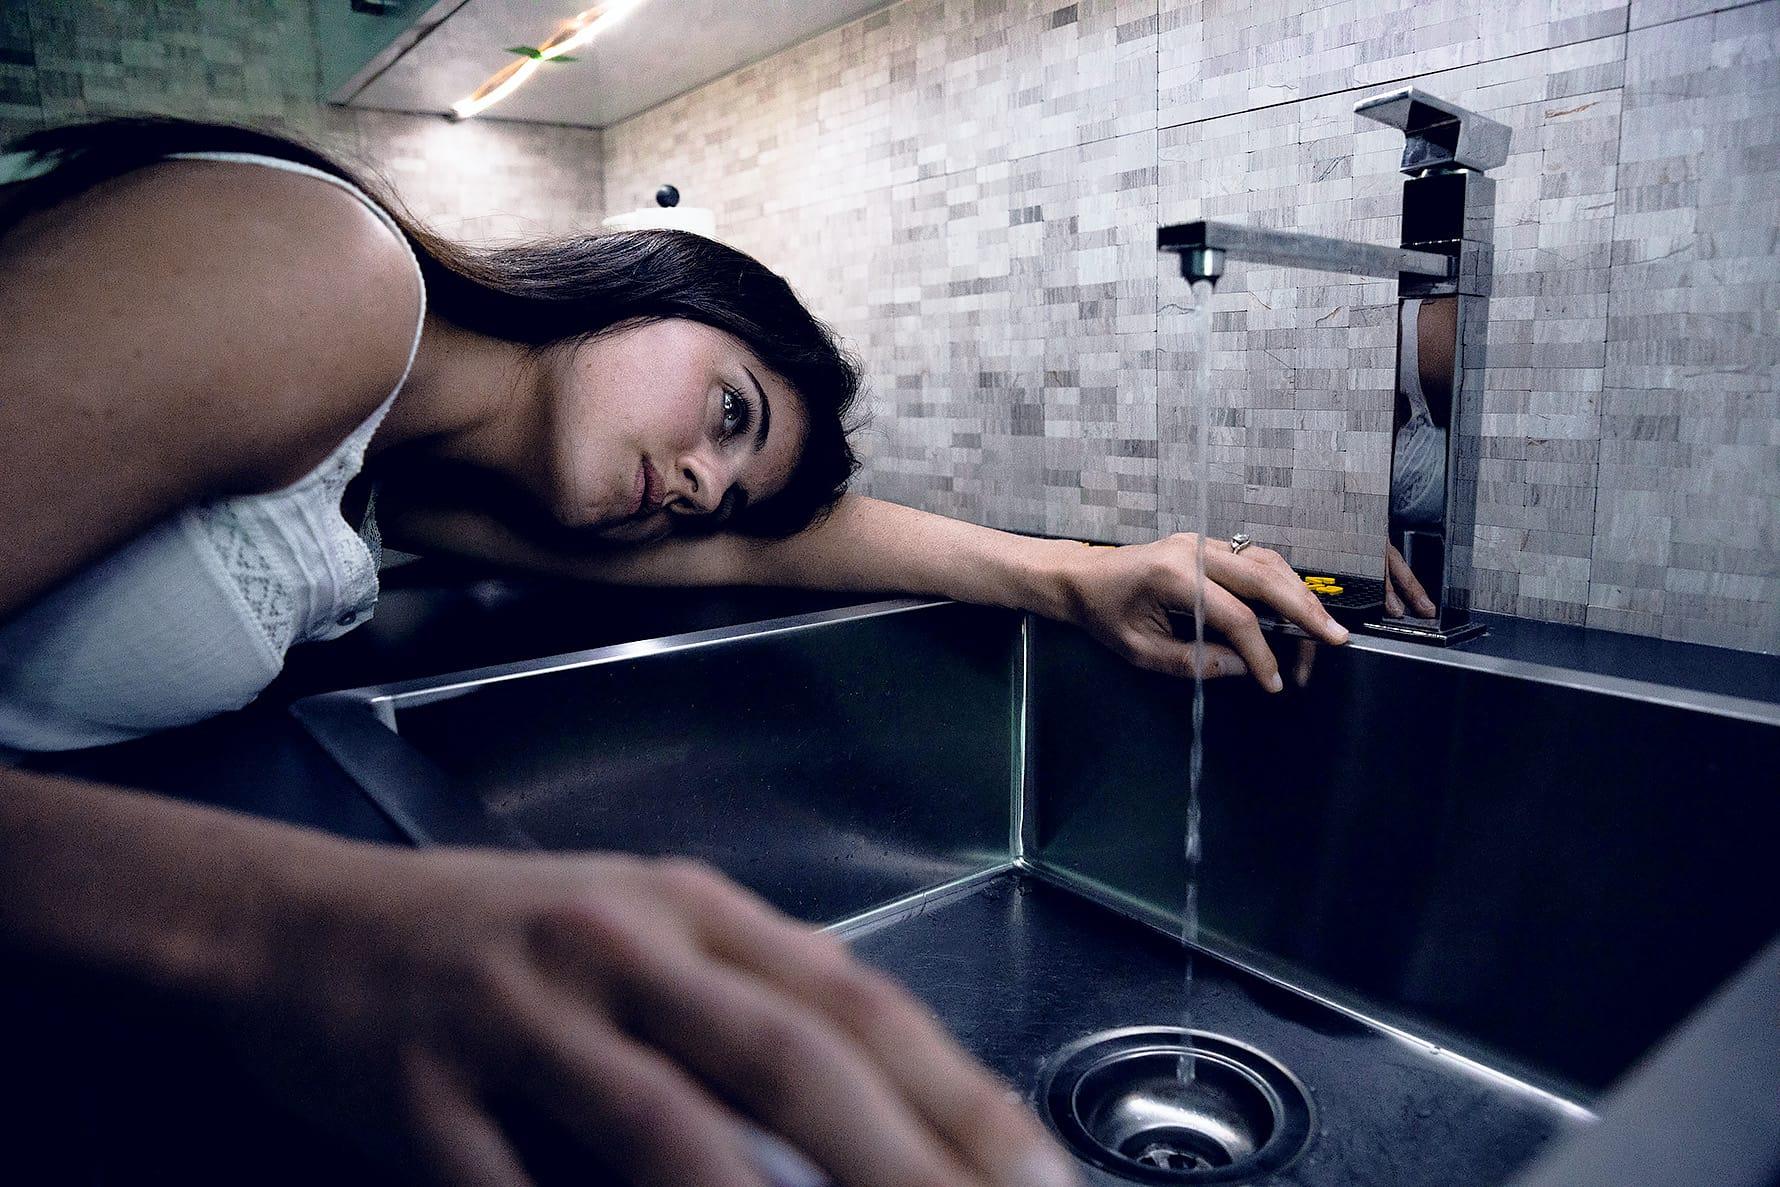 dezinfekcija v frizerskem salonu